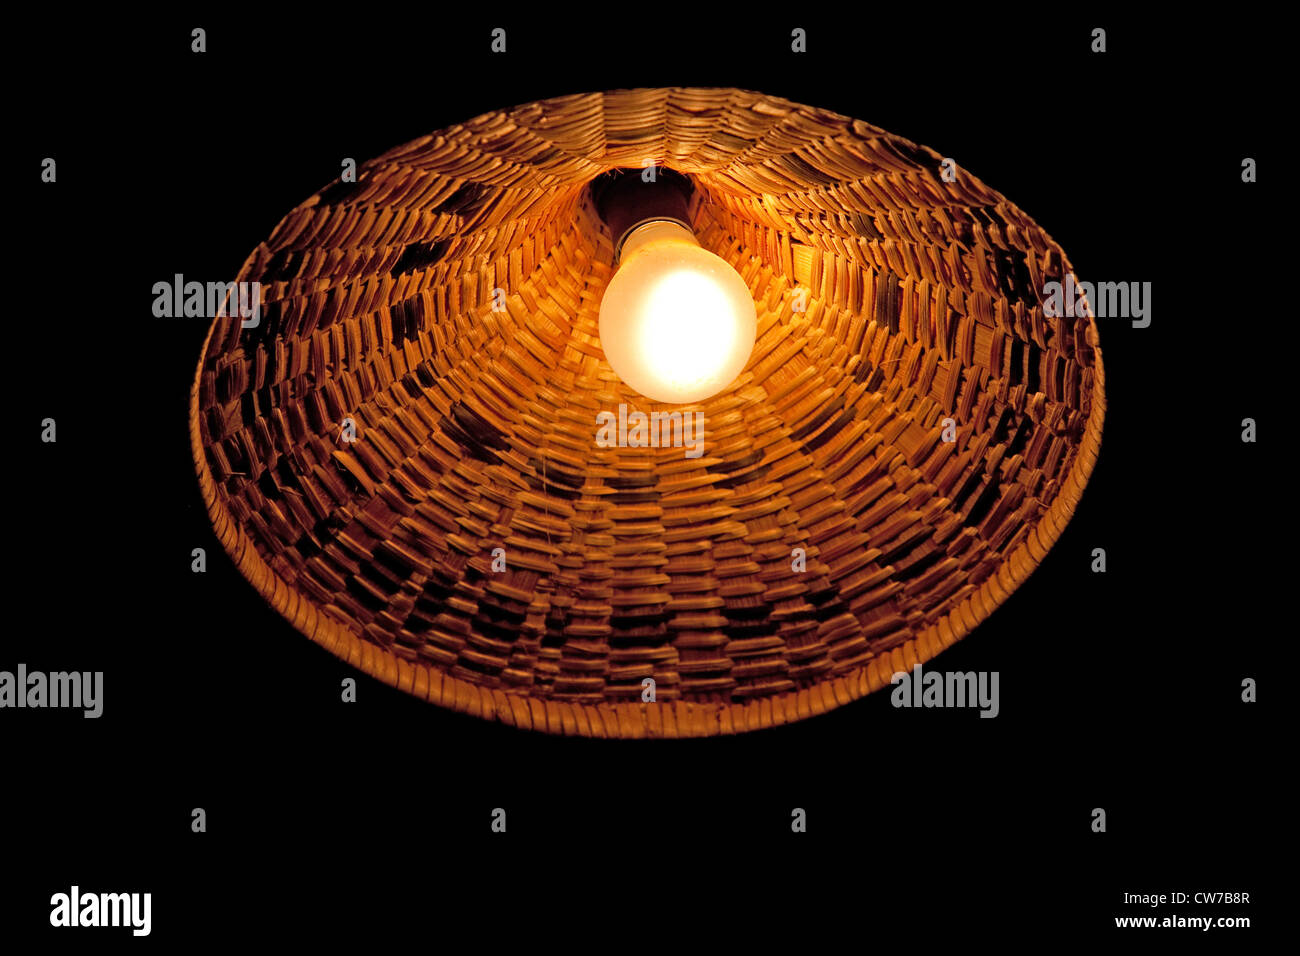 light bulb and lamp shade made of banana fibre, Burundi, Gitega - Stock Image